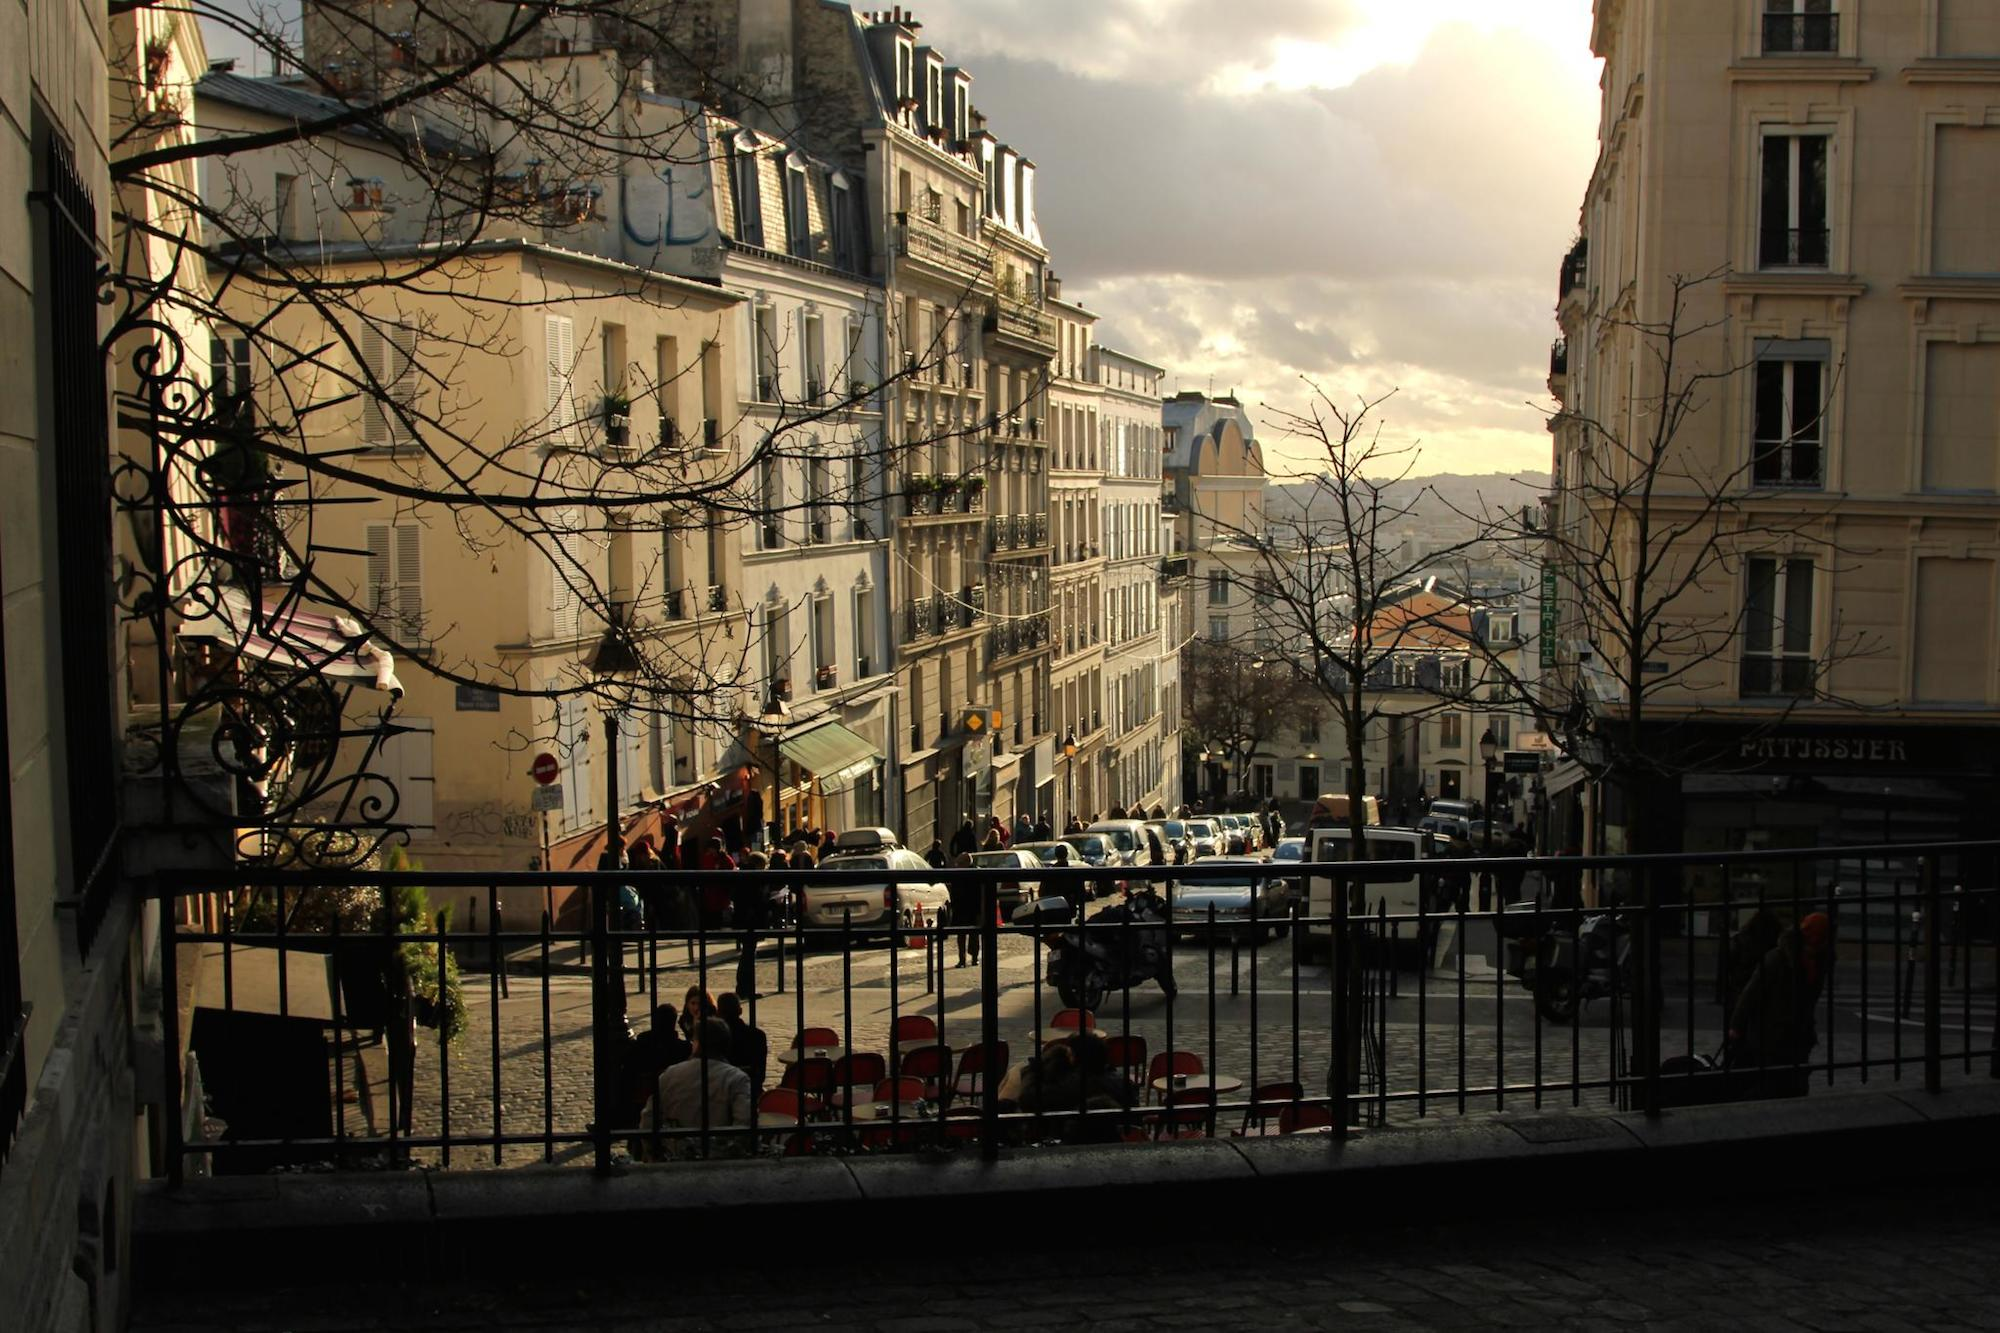 HiP Paris Blog explores what it's like to move to Paris alone